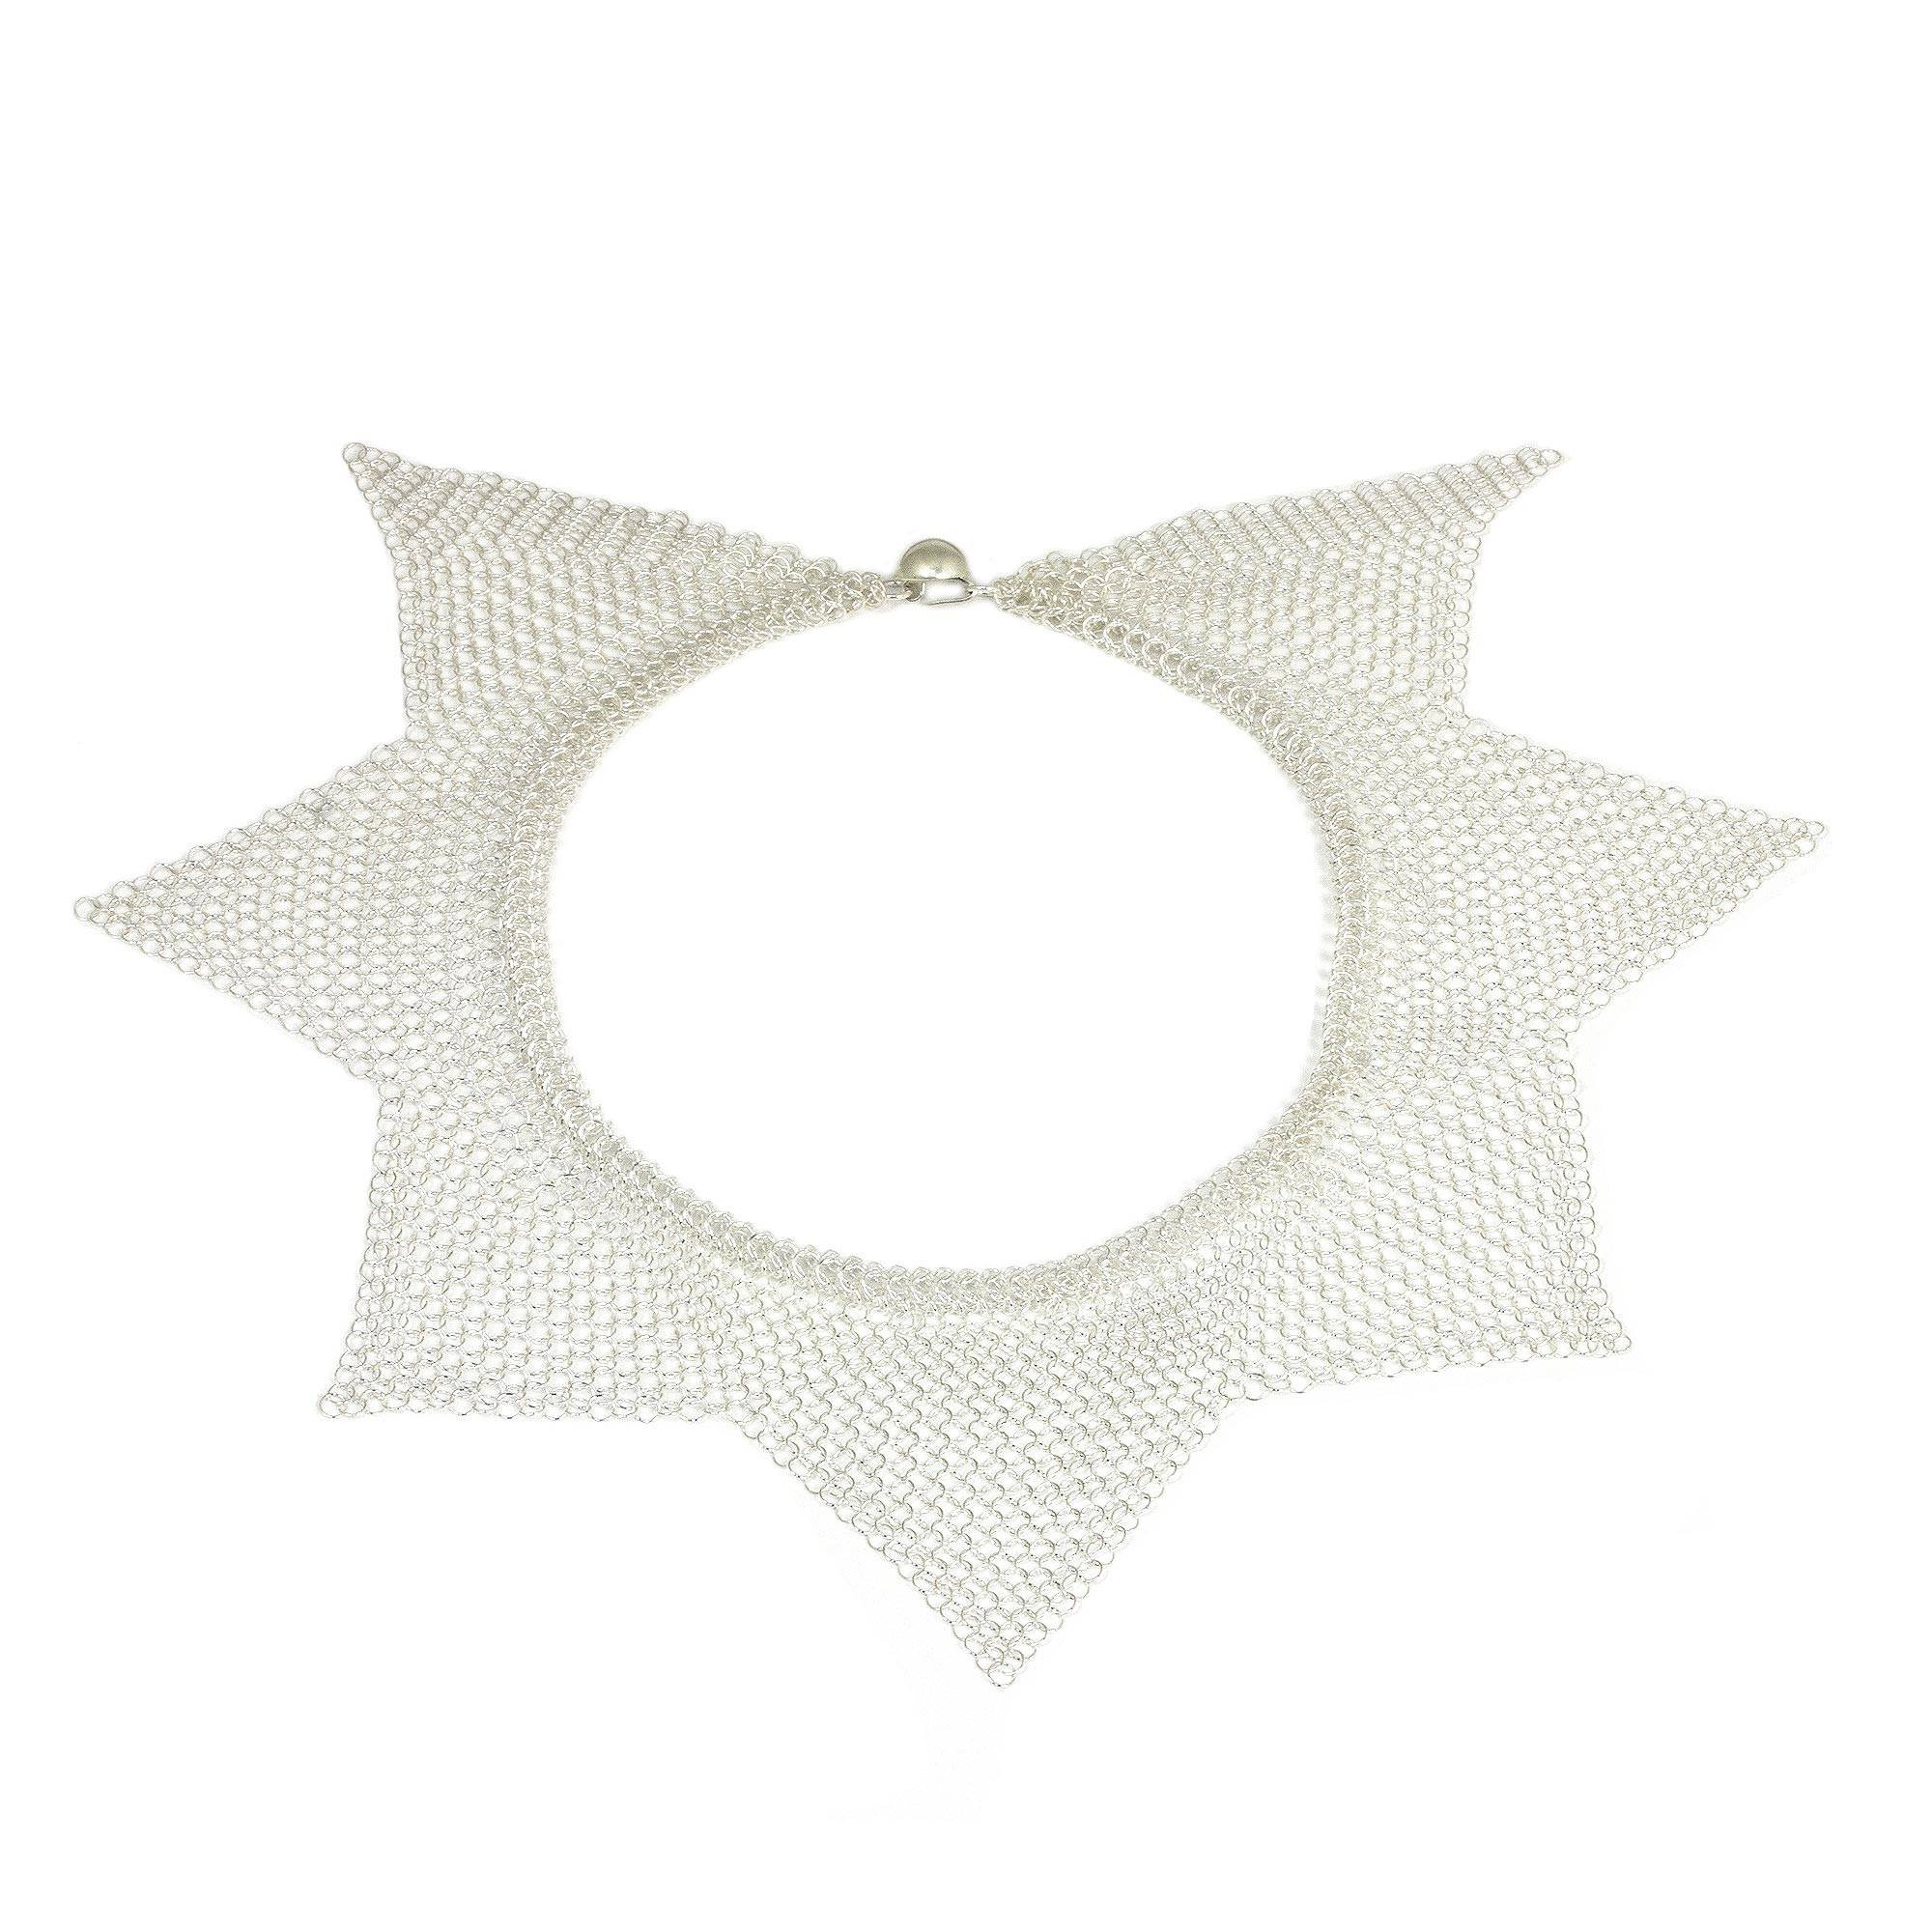 NOVICA .925 Sterling Silver Collar Necklace, 18'', 'Reign'